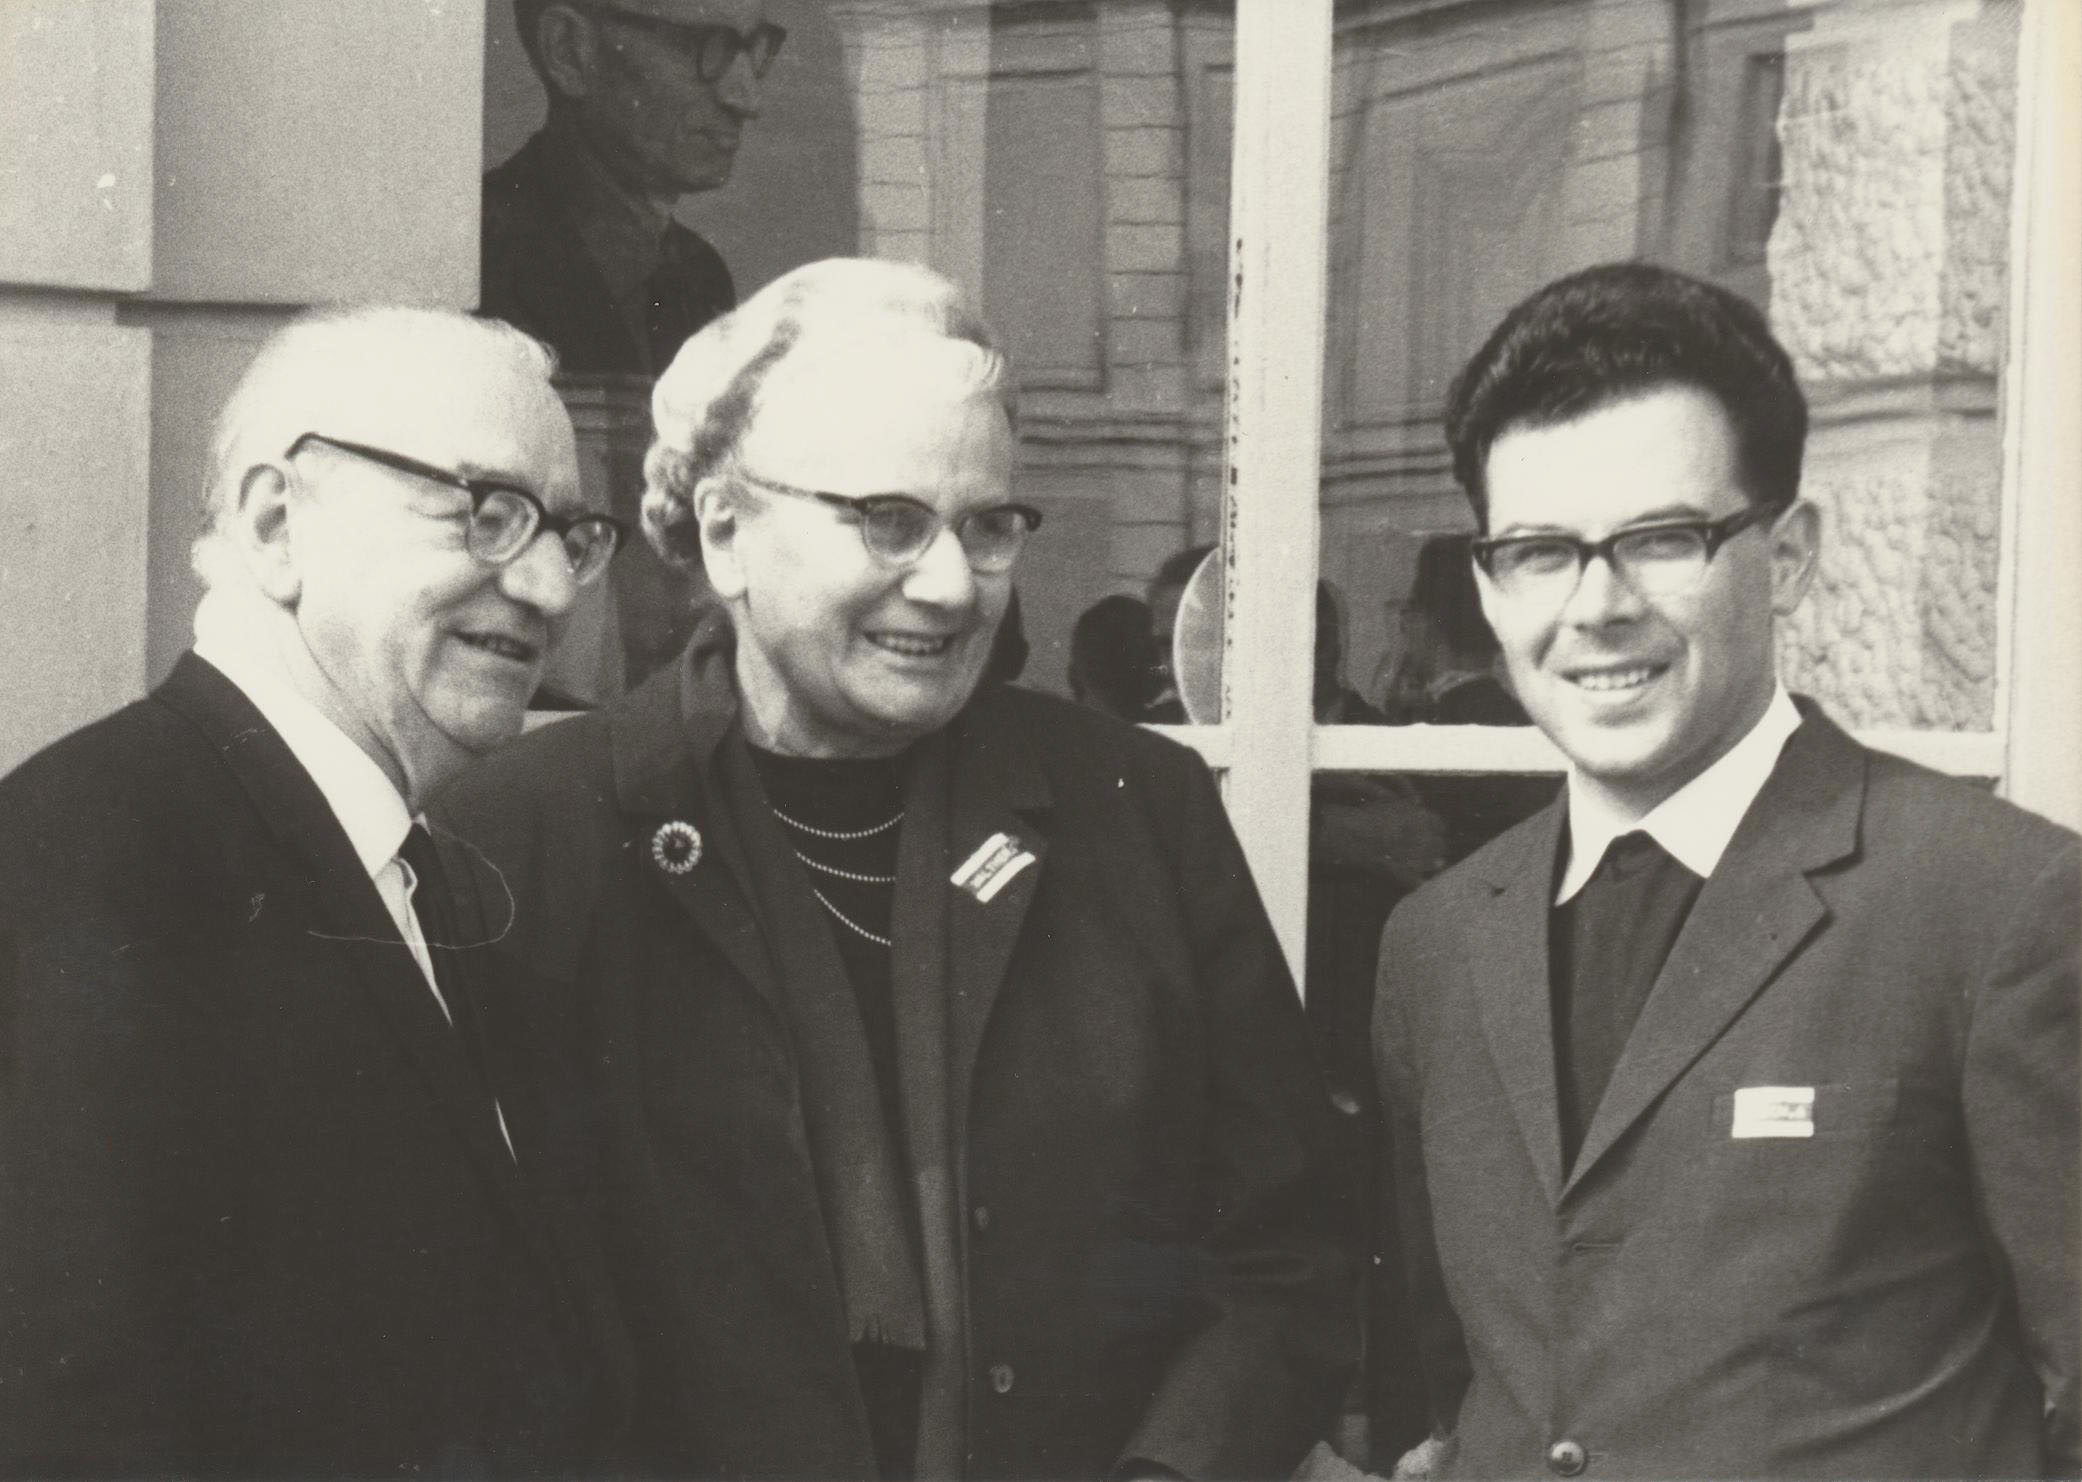 I. Internat. Imago Mundi-Kongress 1966, Prof. Dr. Gebhard Frei, Dr. Gerda Walther, Dr. Andreas Resch